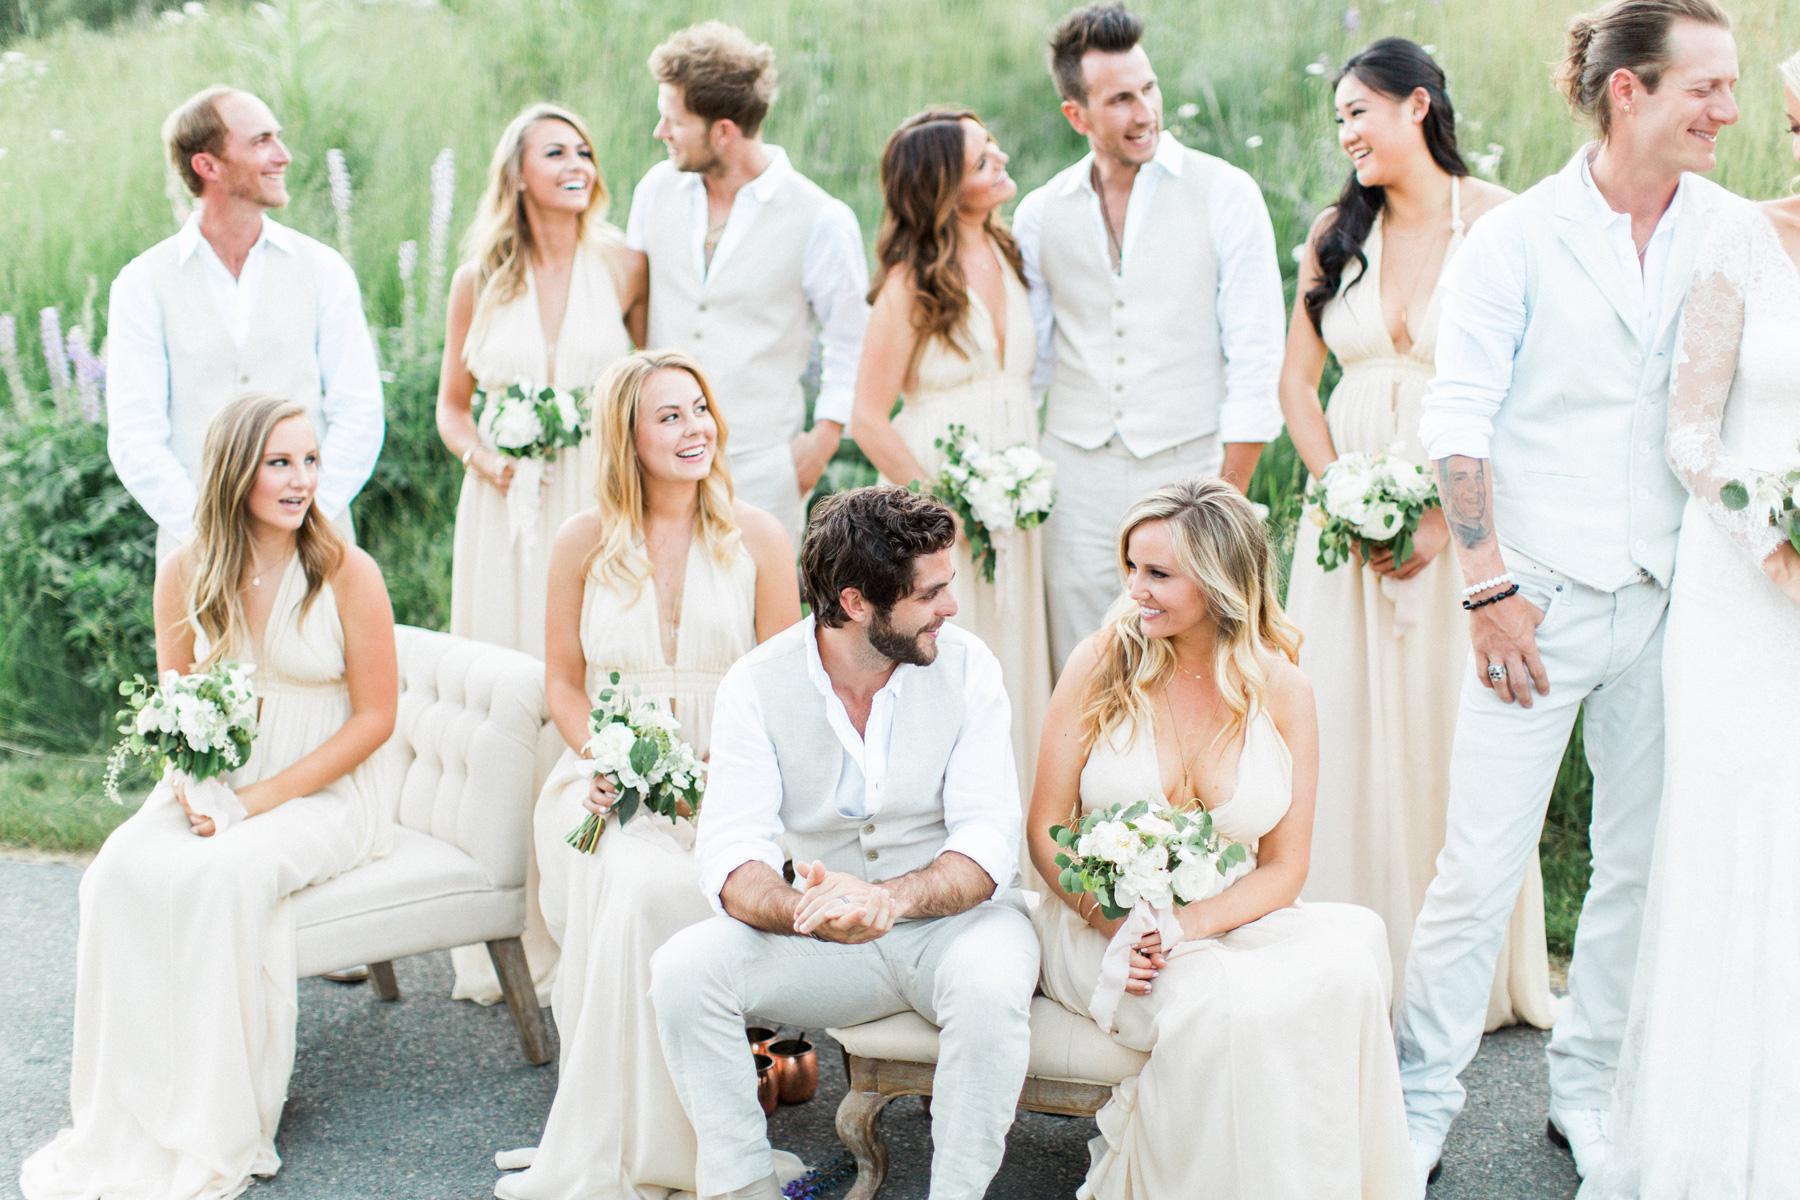 tyler-hubbard-wedding-02.jpg